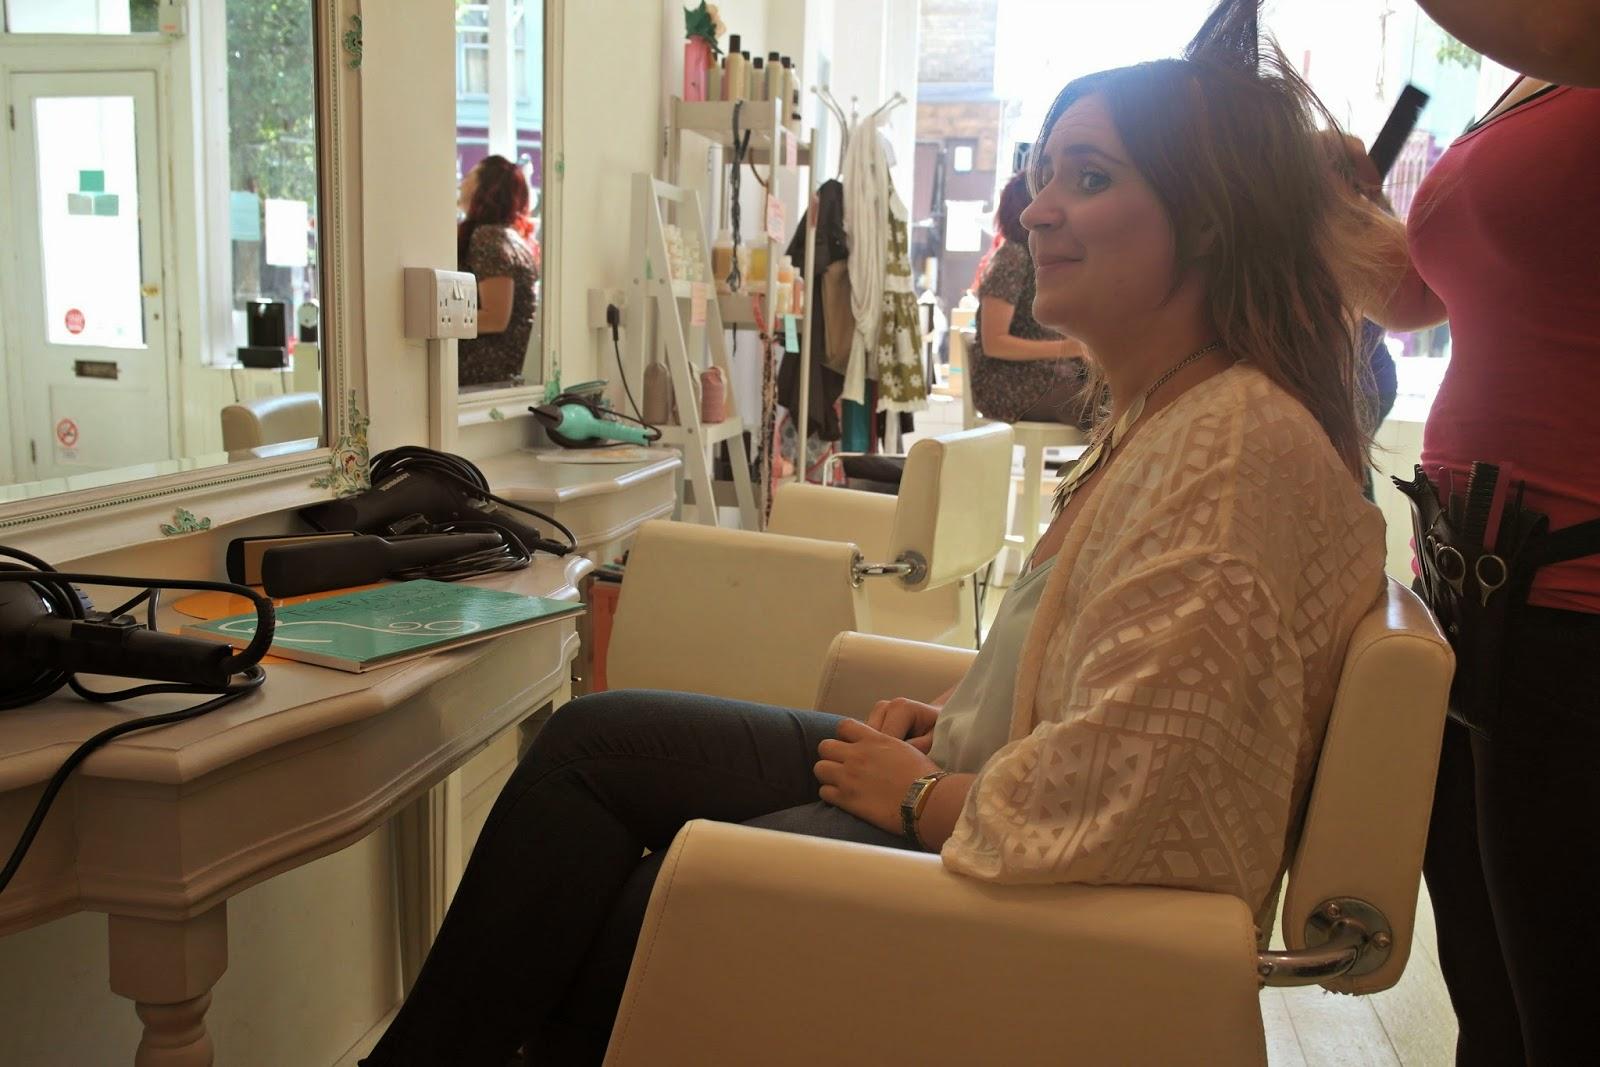 London blowdry salon review